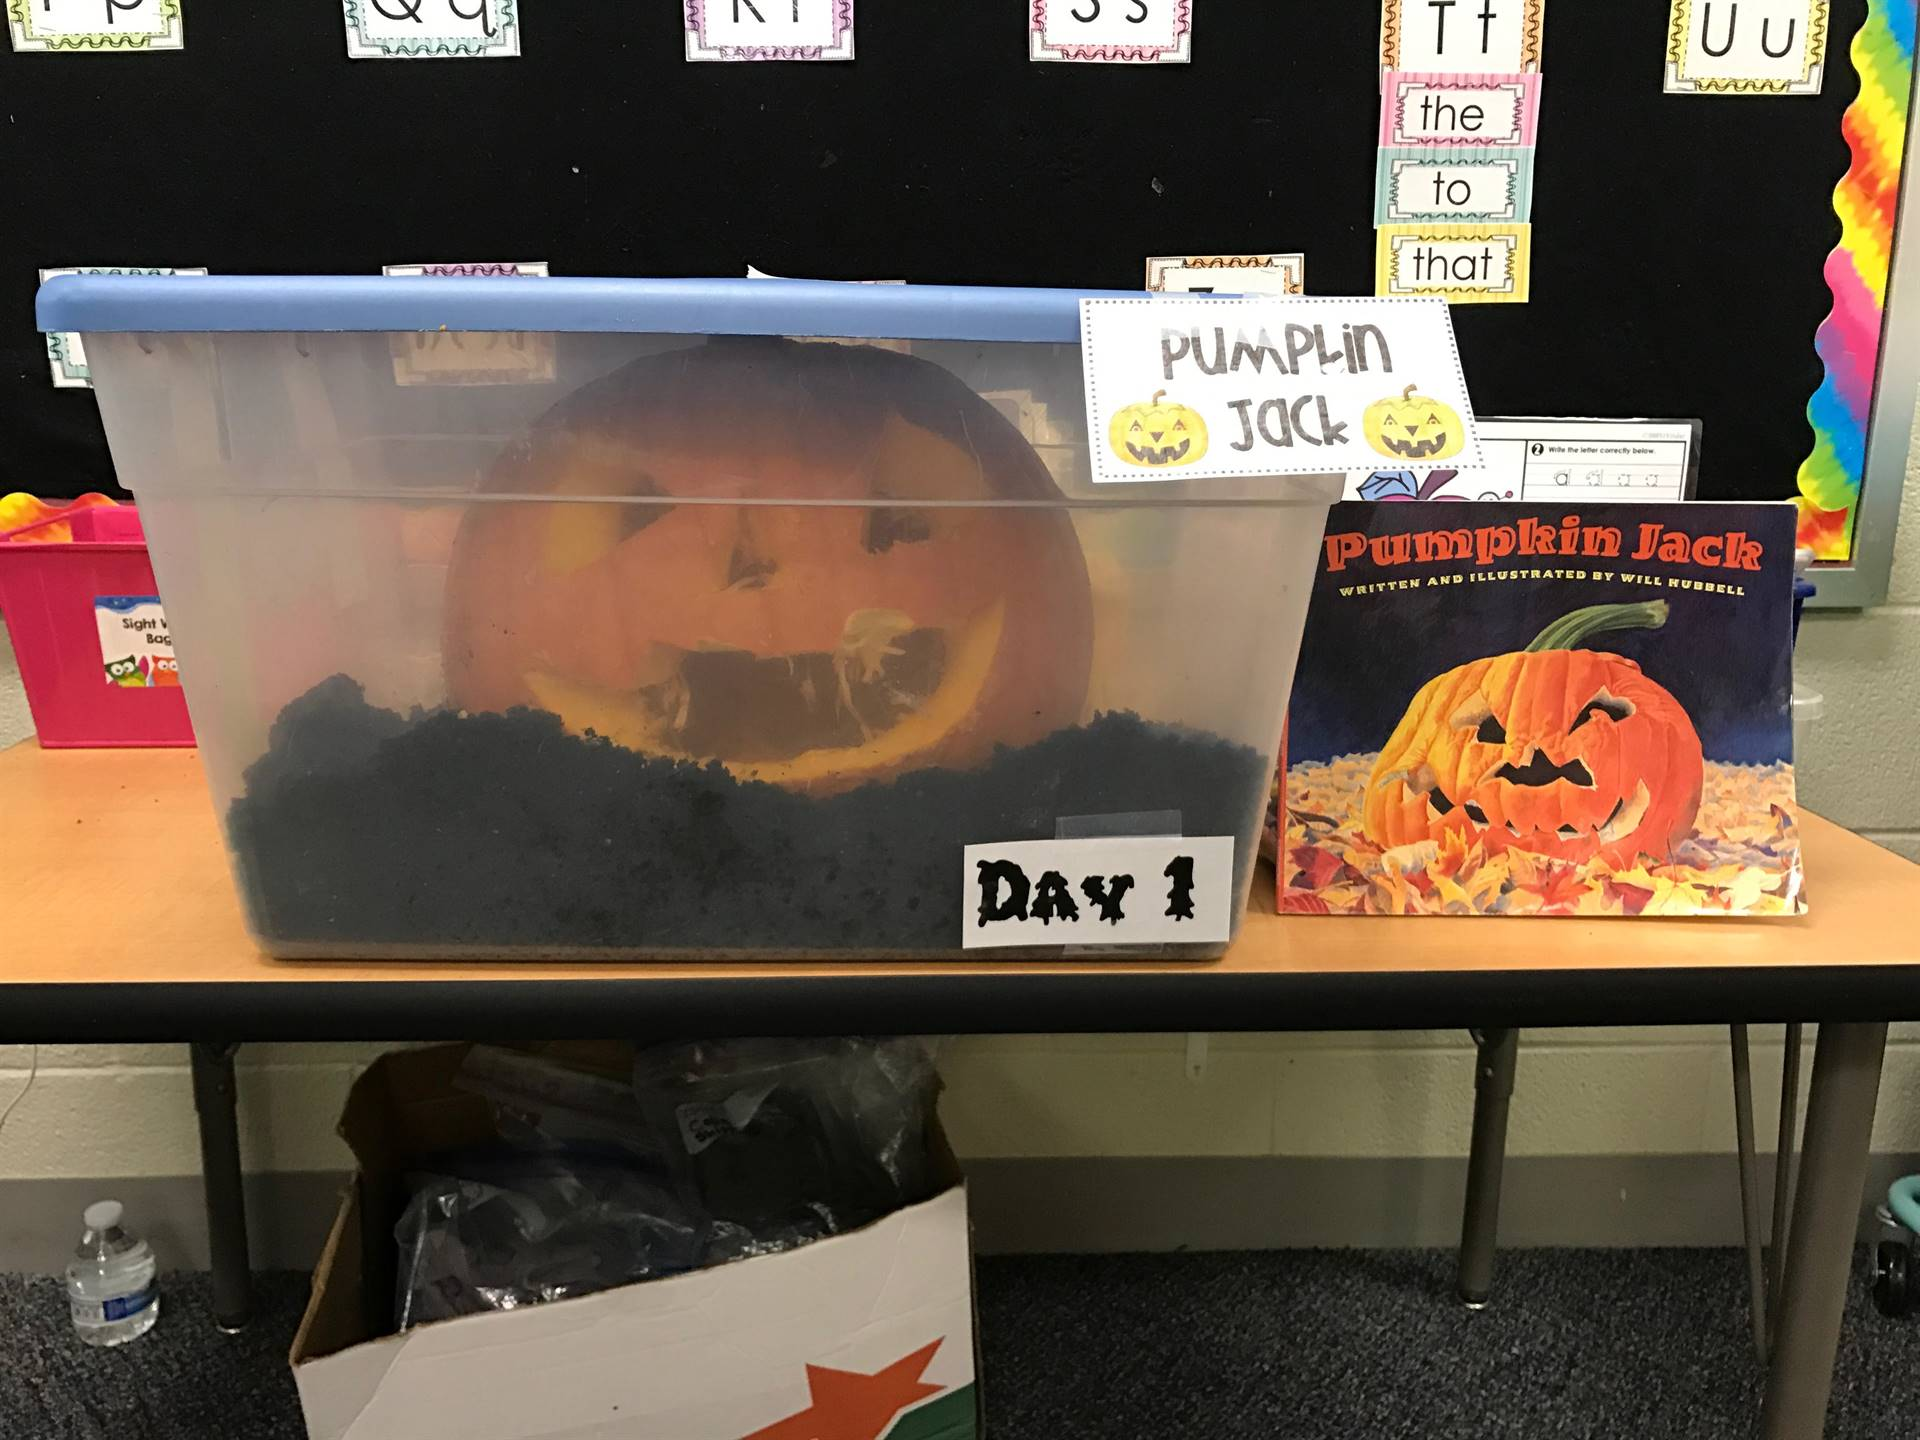 Day 1 of Pumpkin Jack